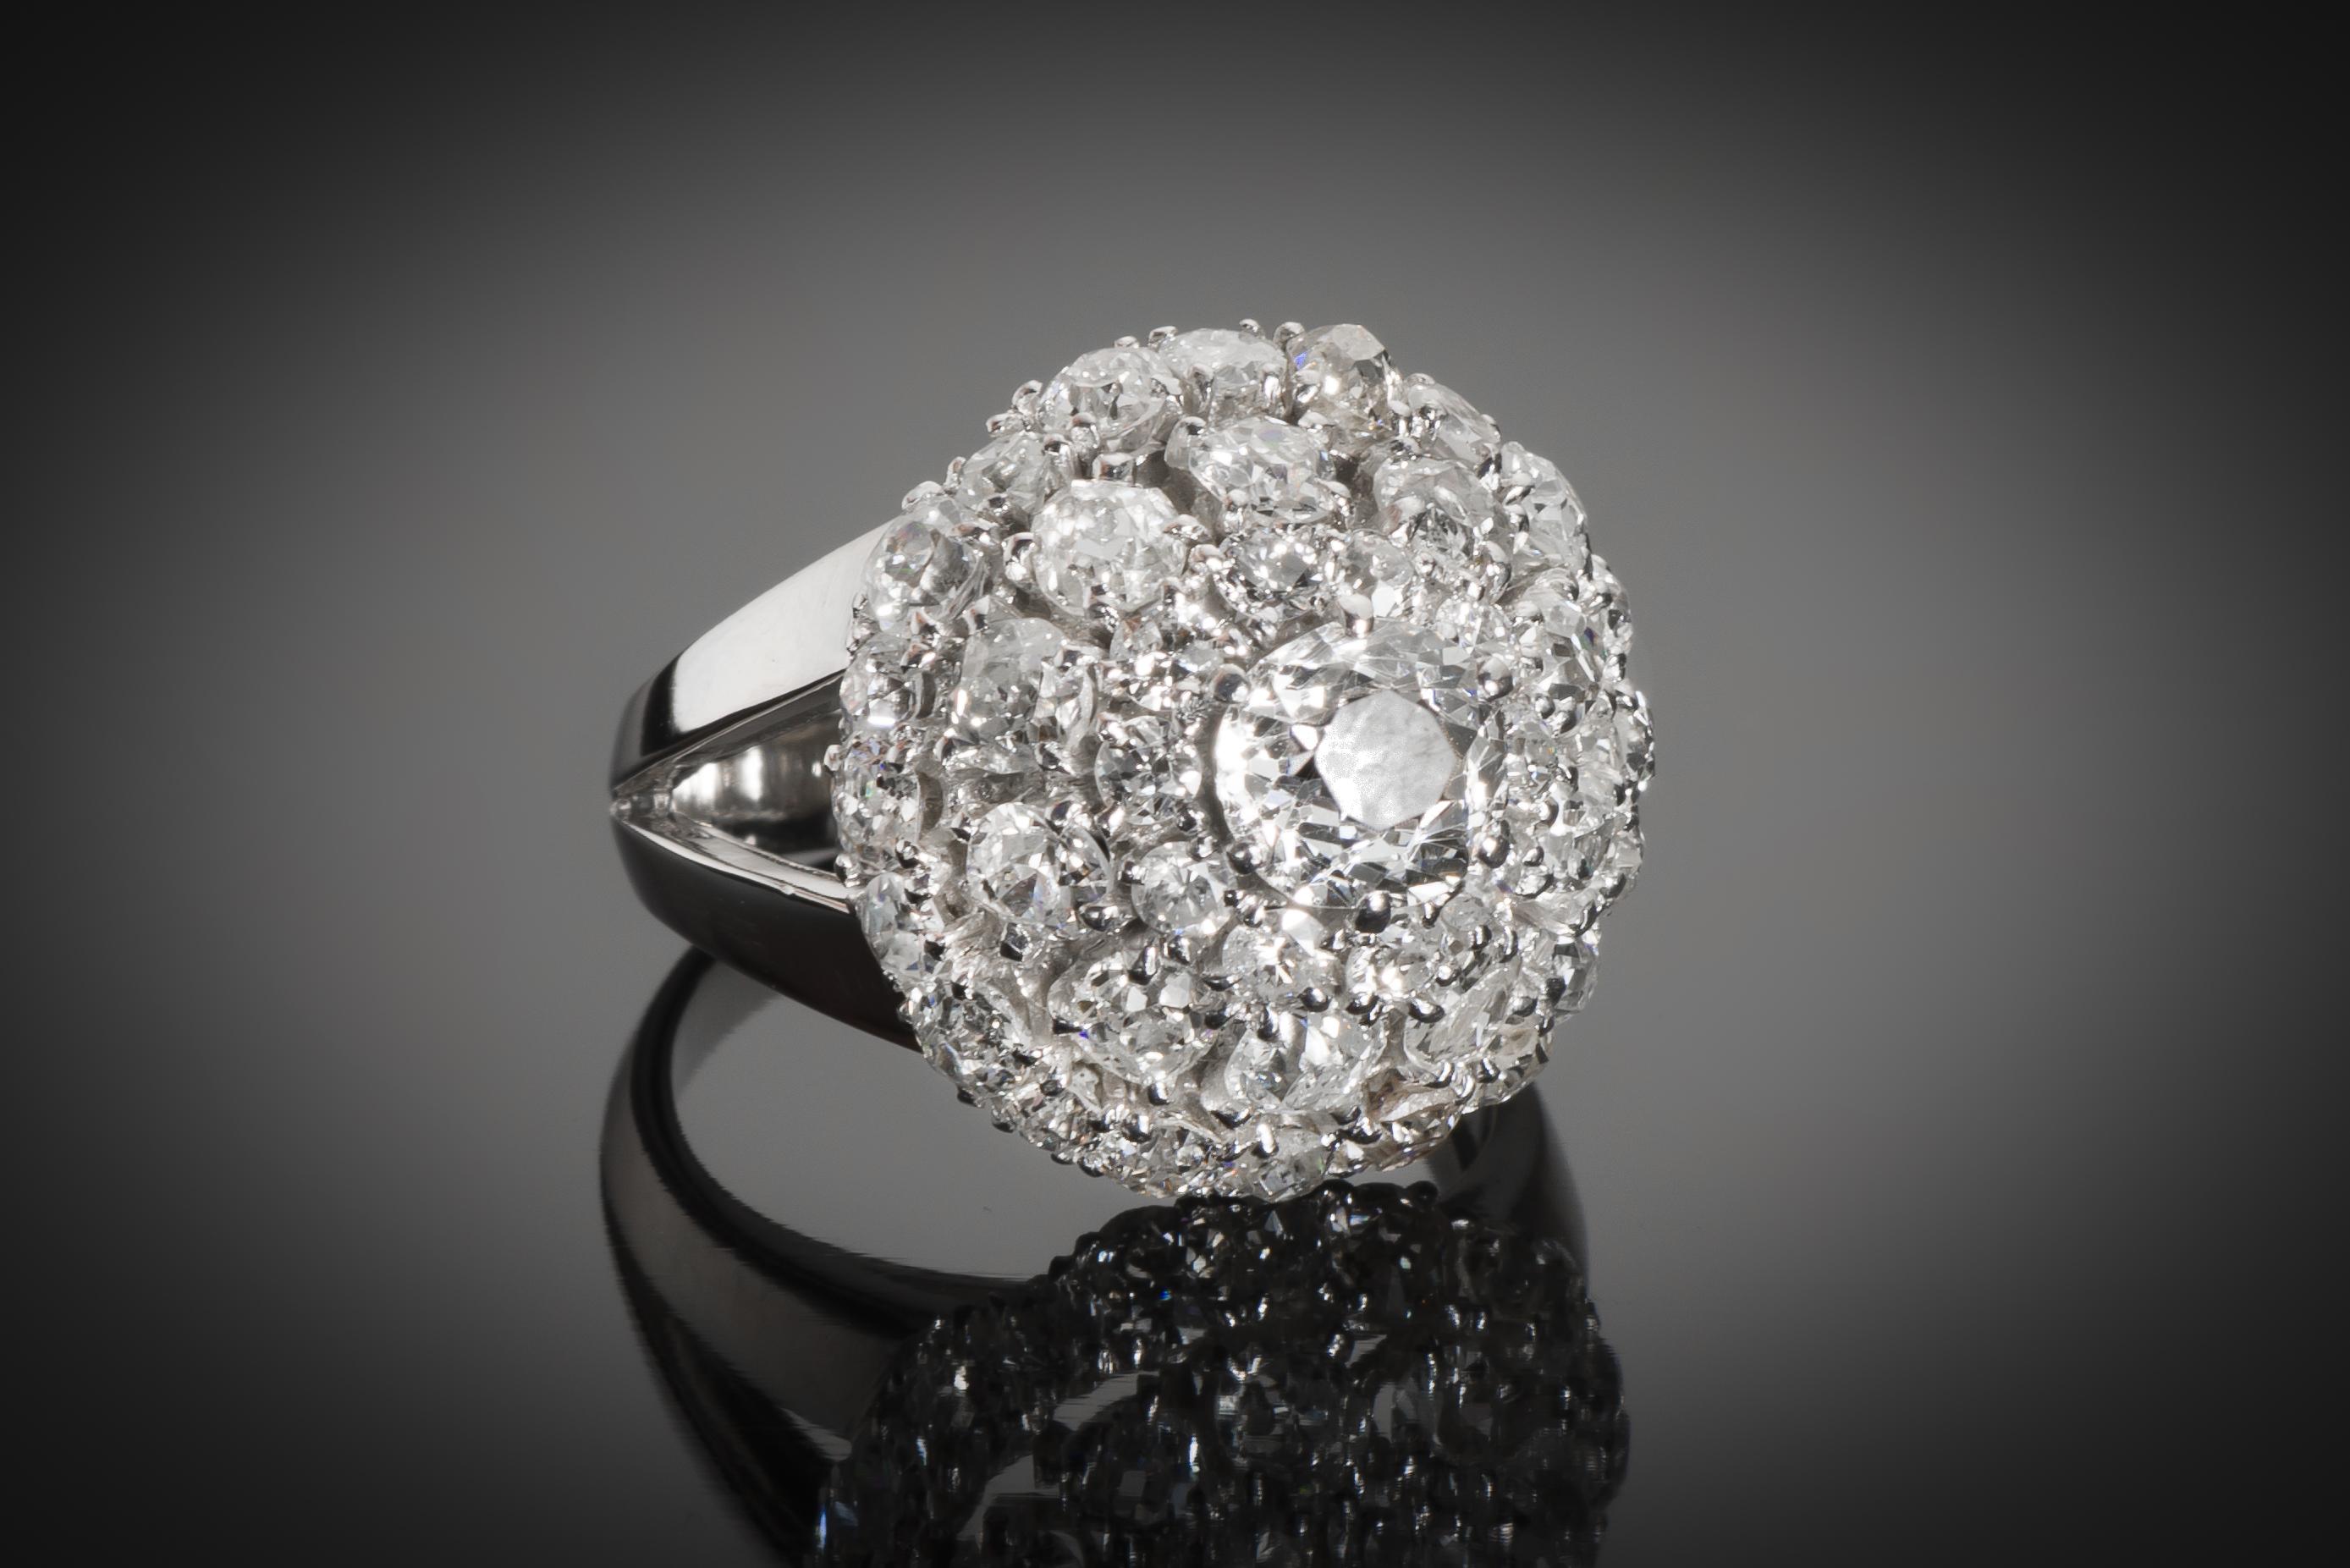 Bague Boucheron diamants vers 1950-1